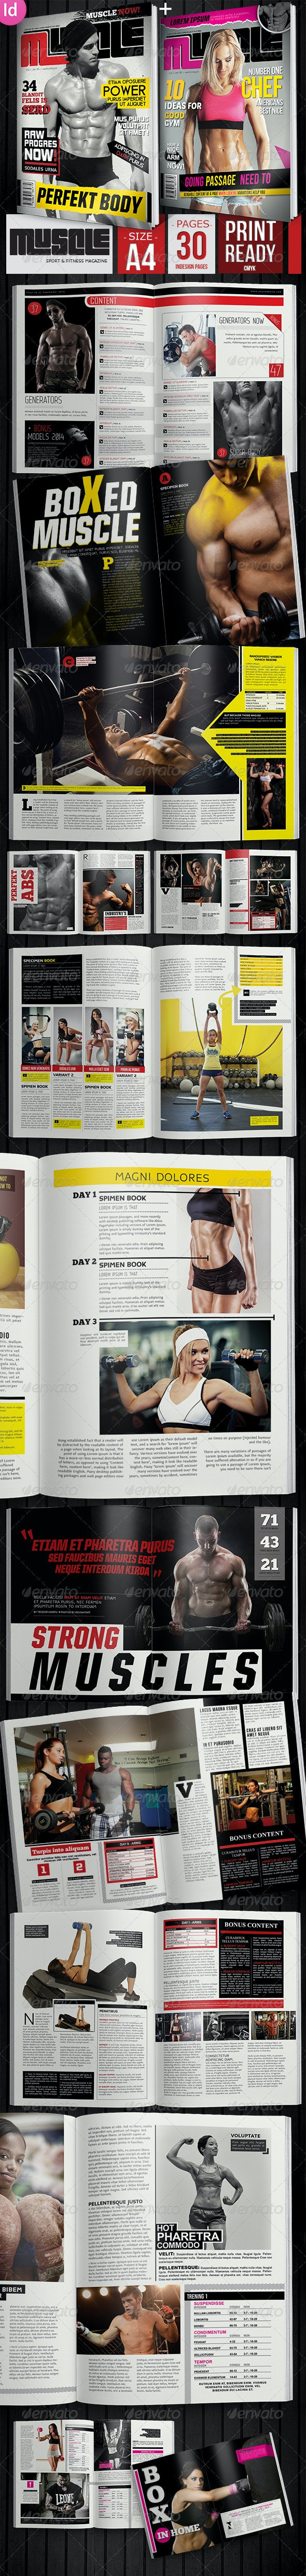 Sport & Fitness Magazine + 2 Covers - Magazines Print Templates